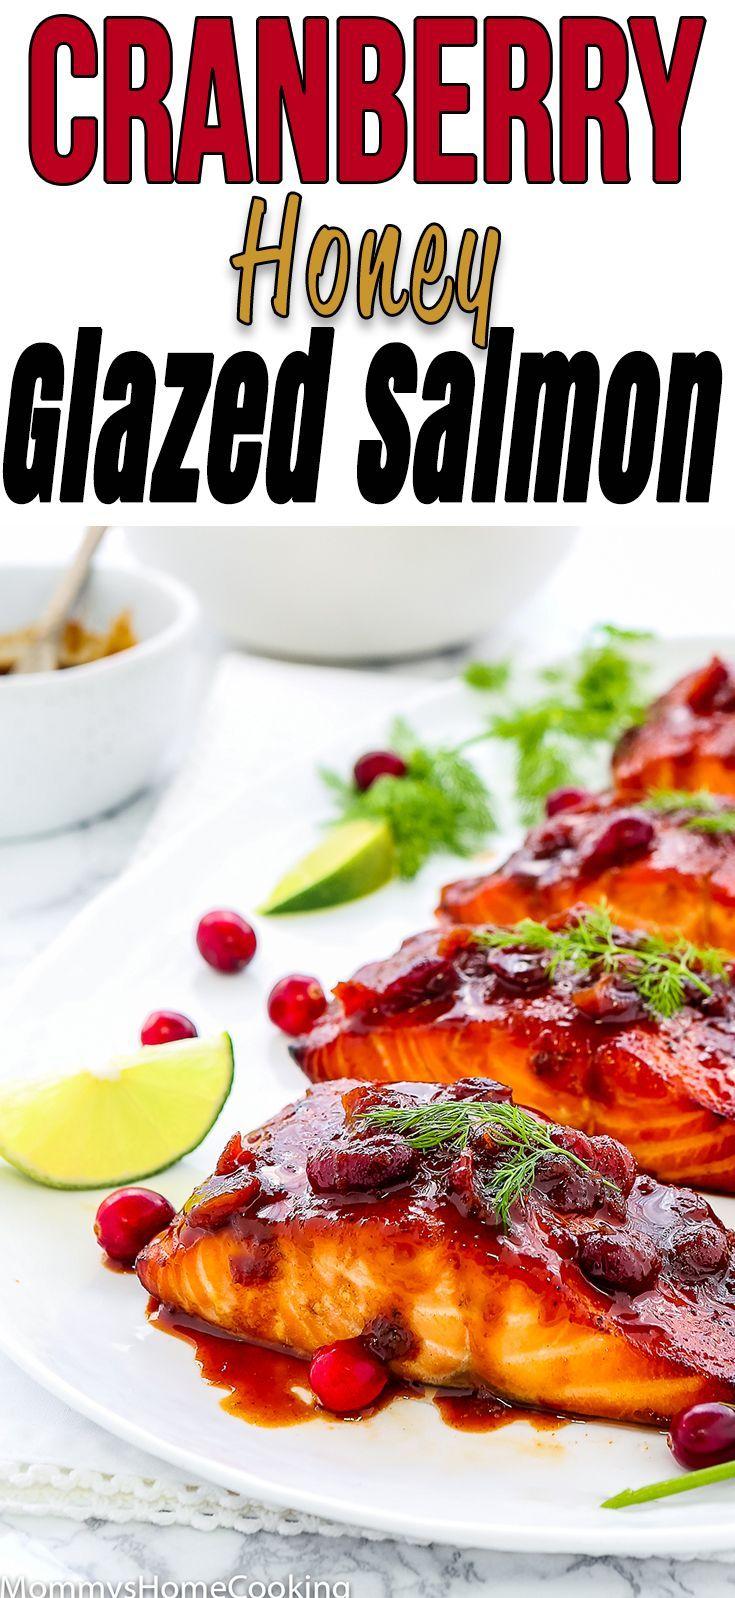 Cranberry Honey Glazed Salmon Recipe